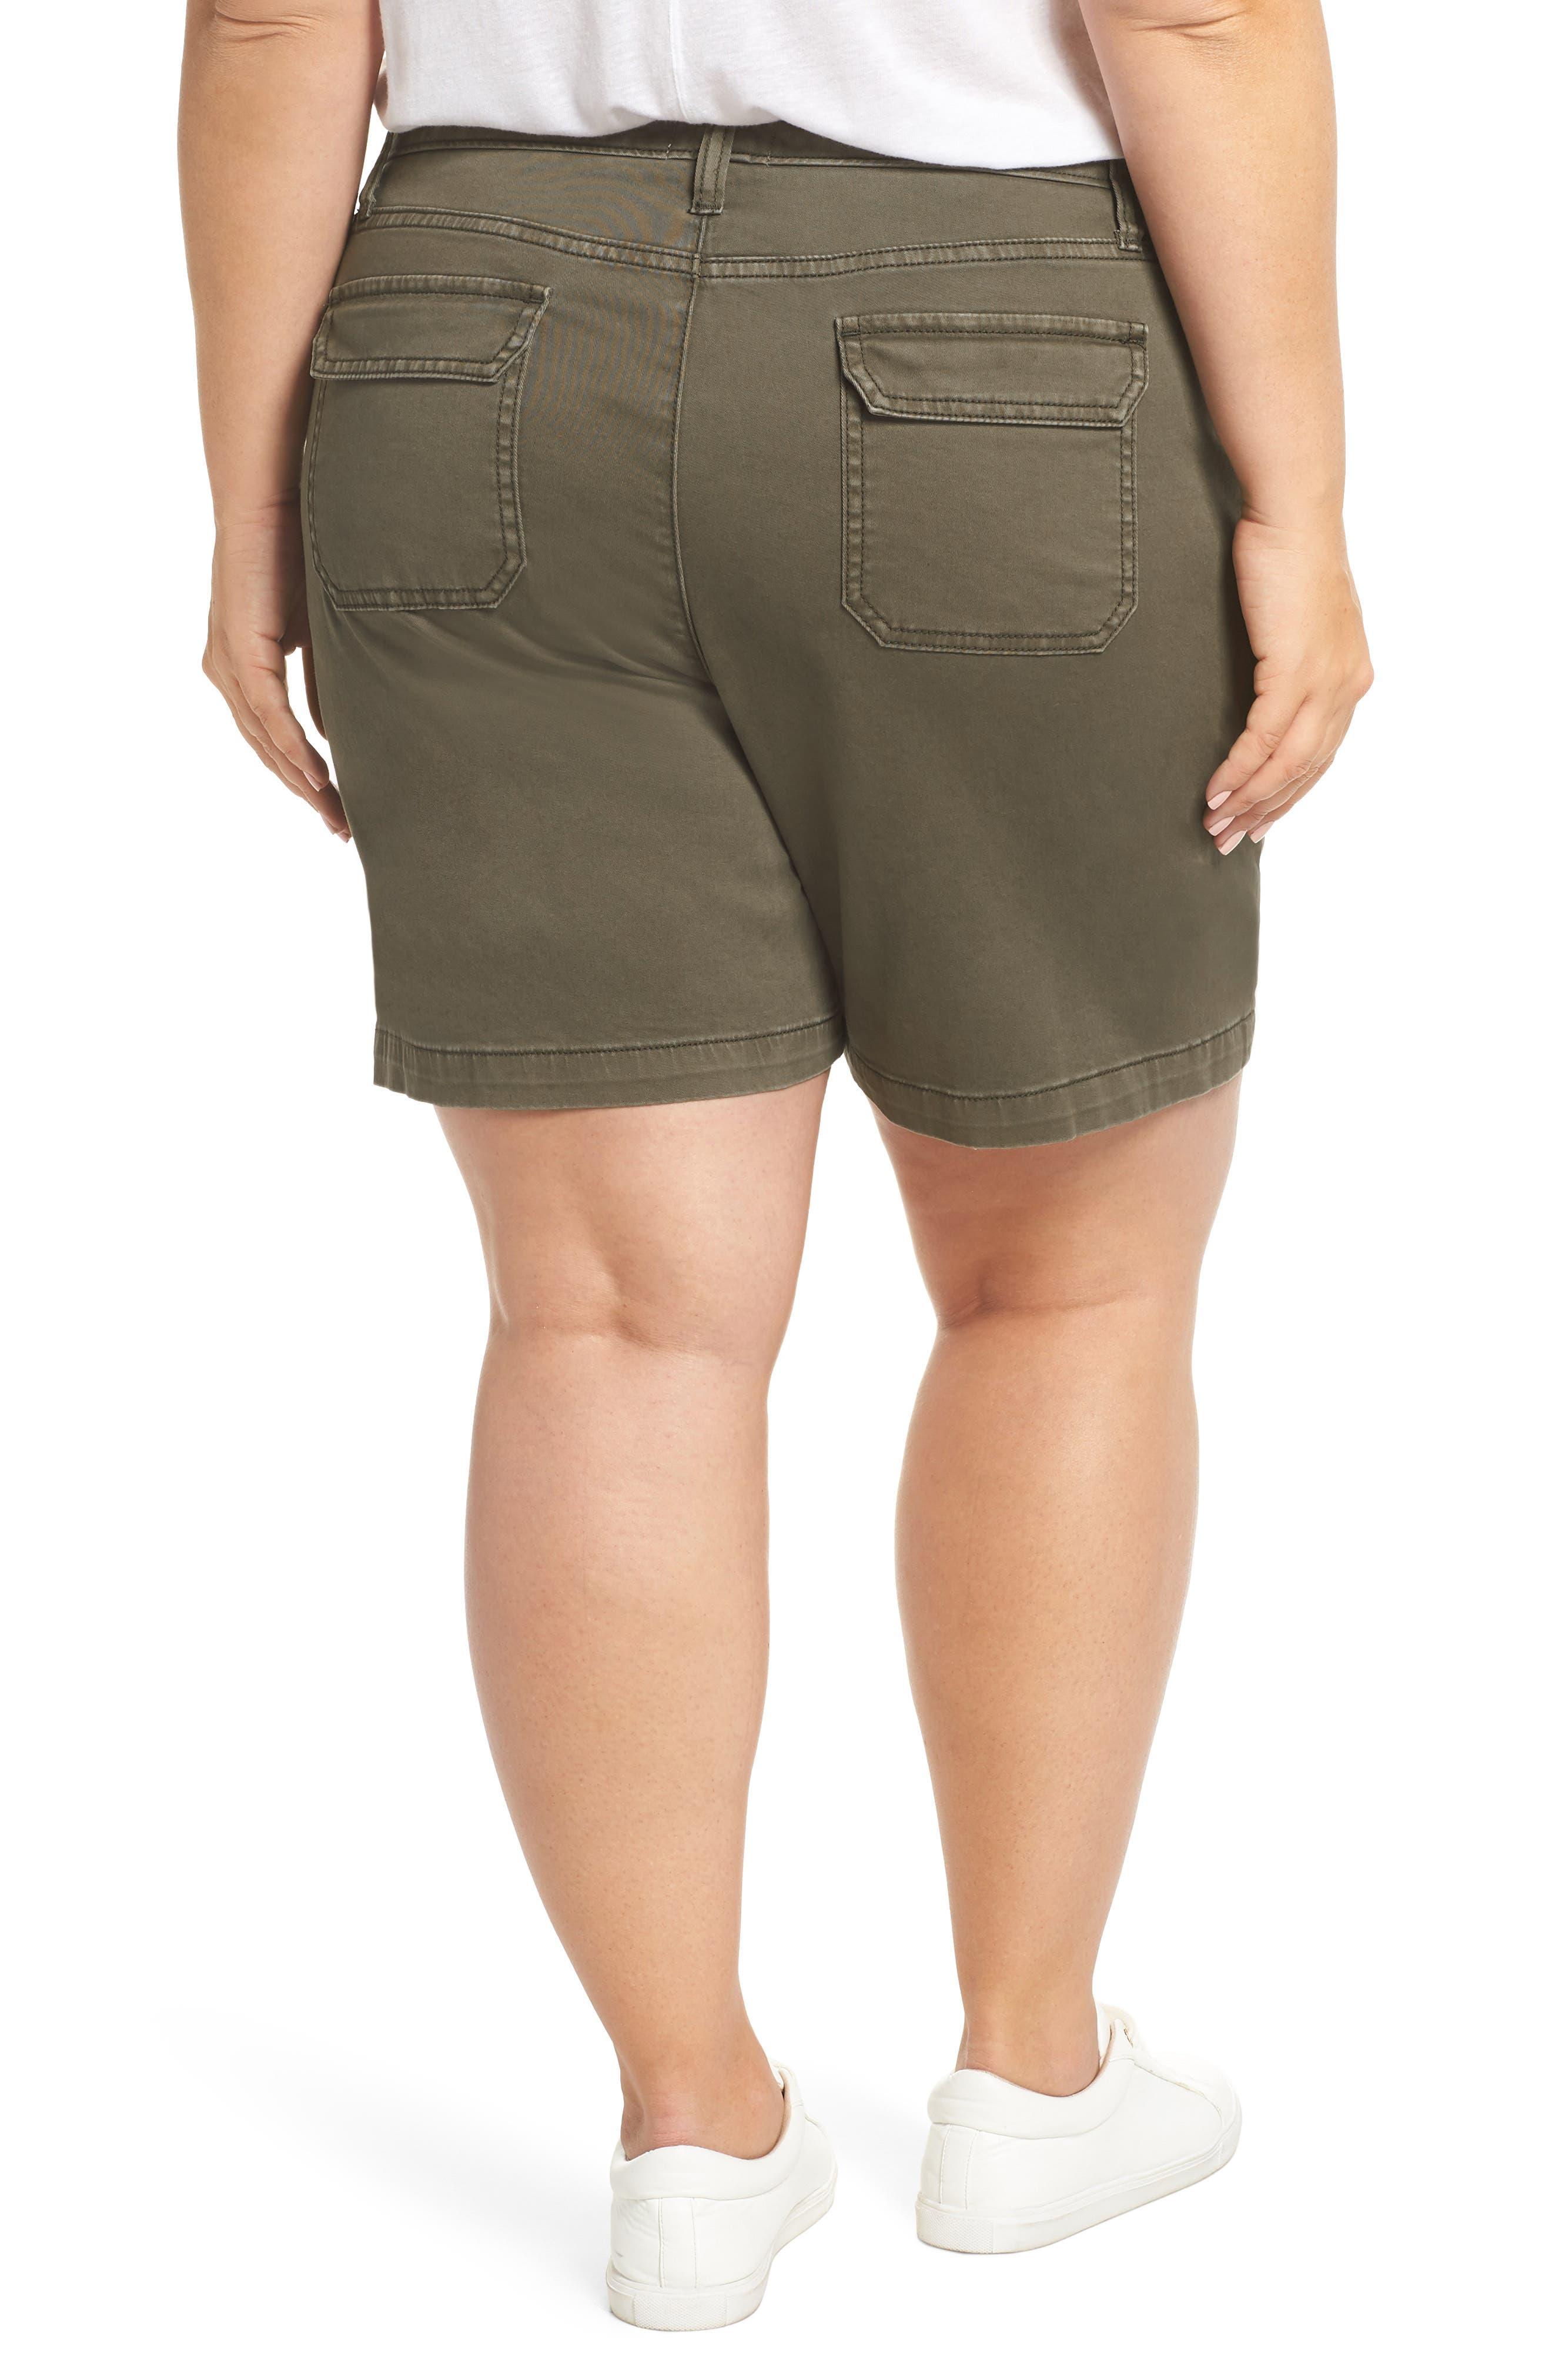 Utility Shorts,                             Alternate thumbnail 2, color,                             OLIVE SARMA